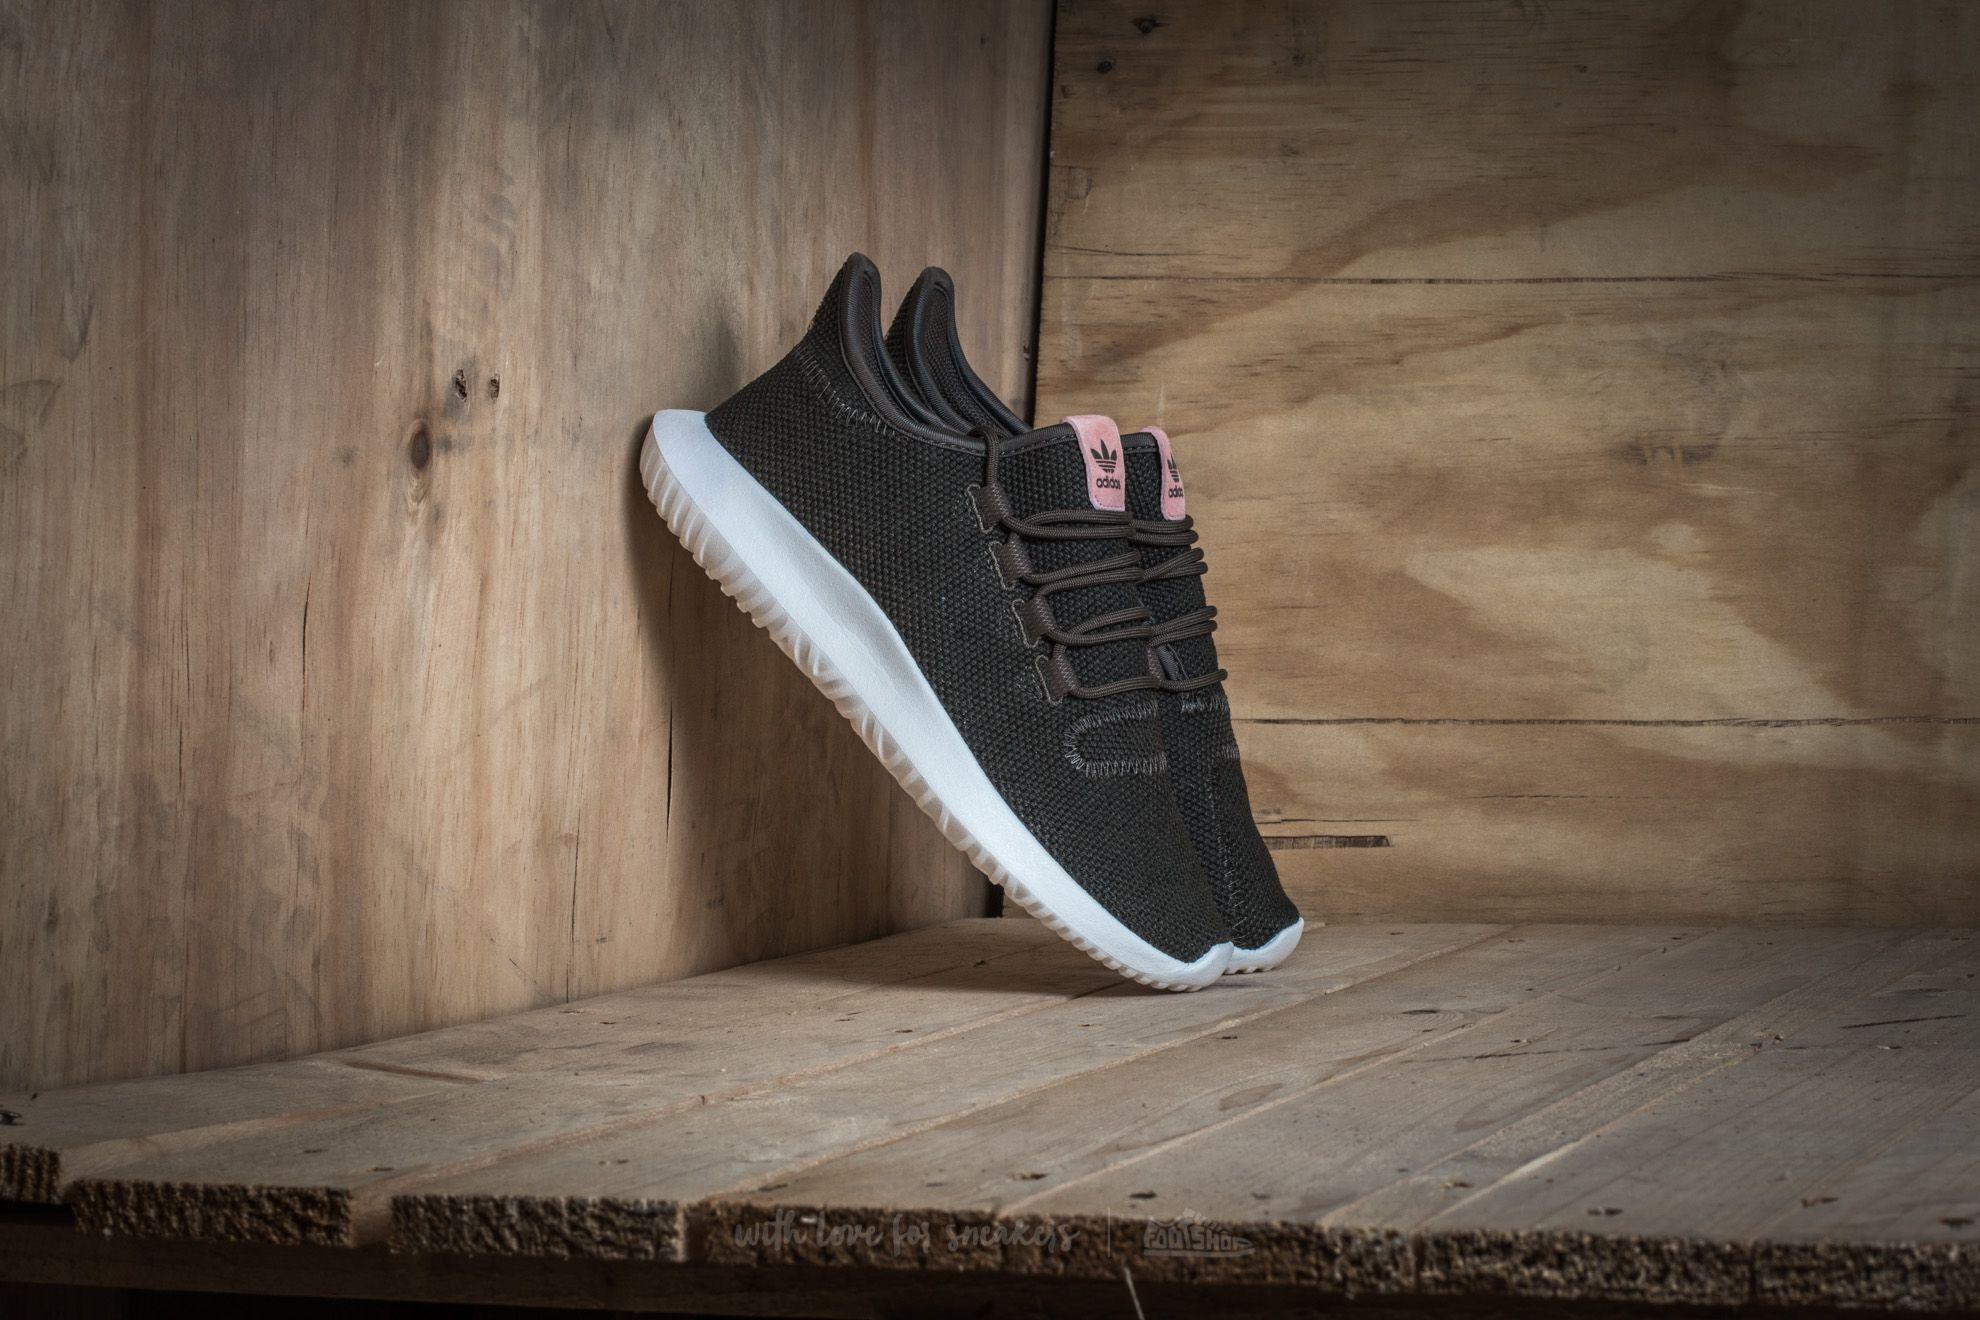 adidas tubular shadow nere e bianche 65% di sconto www